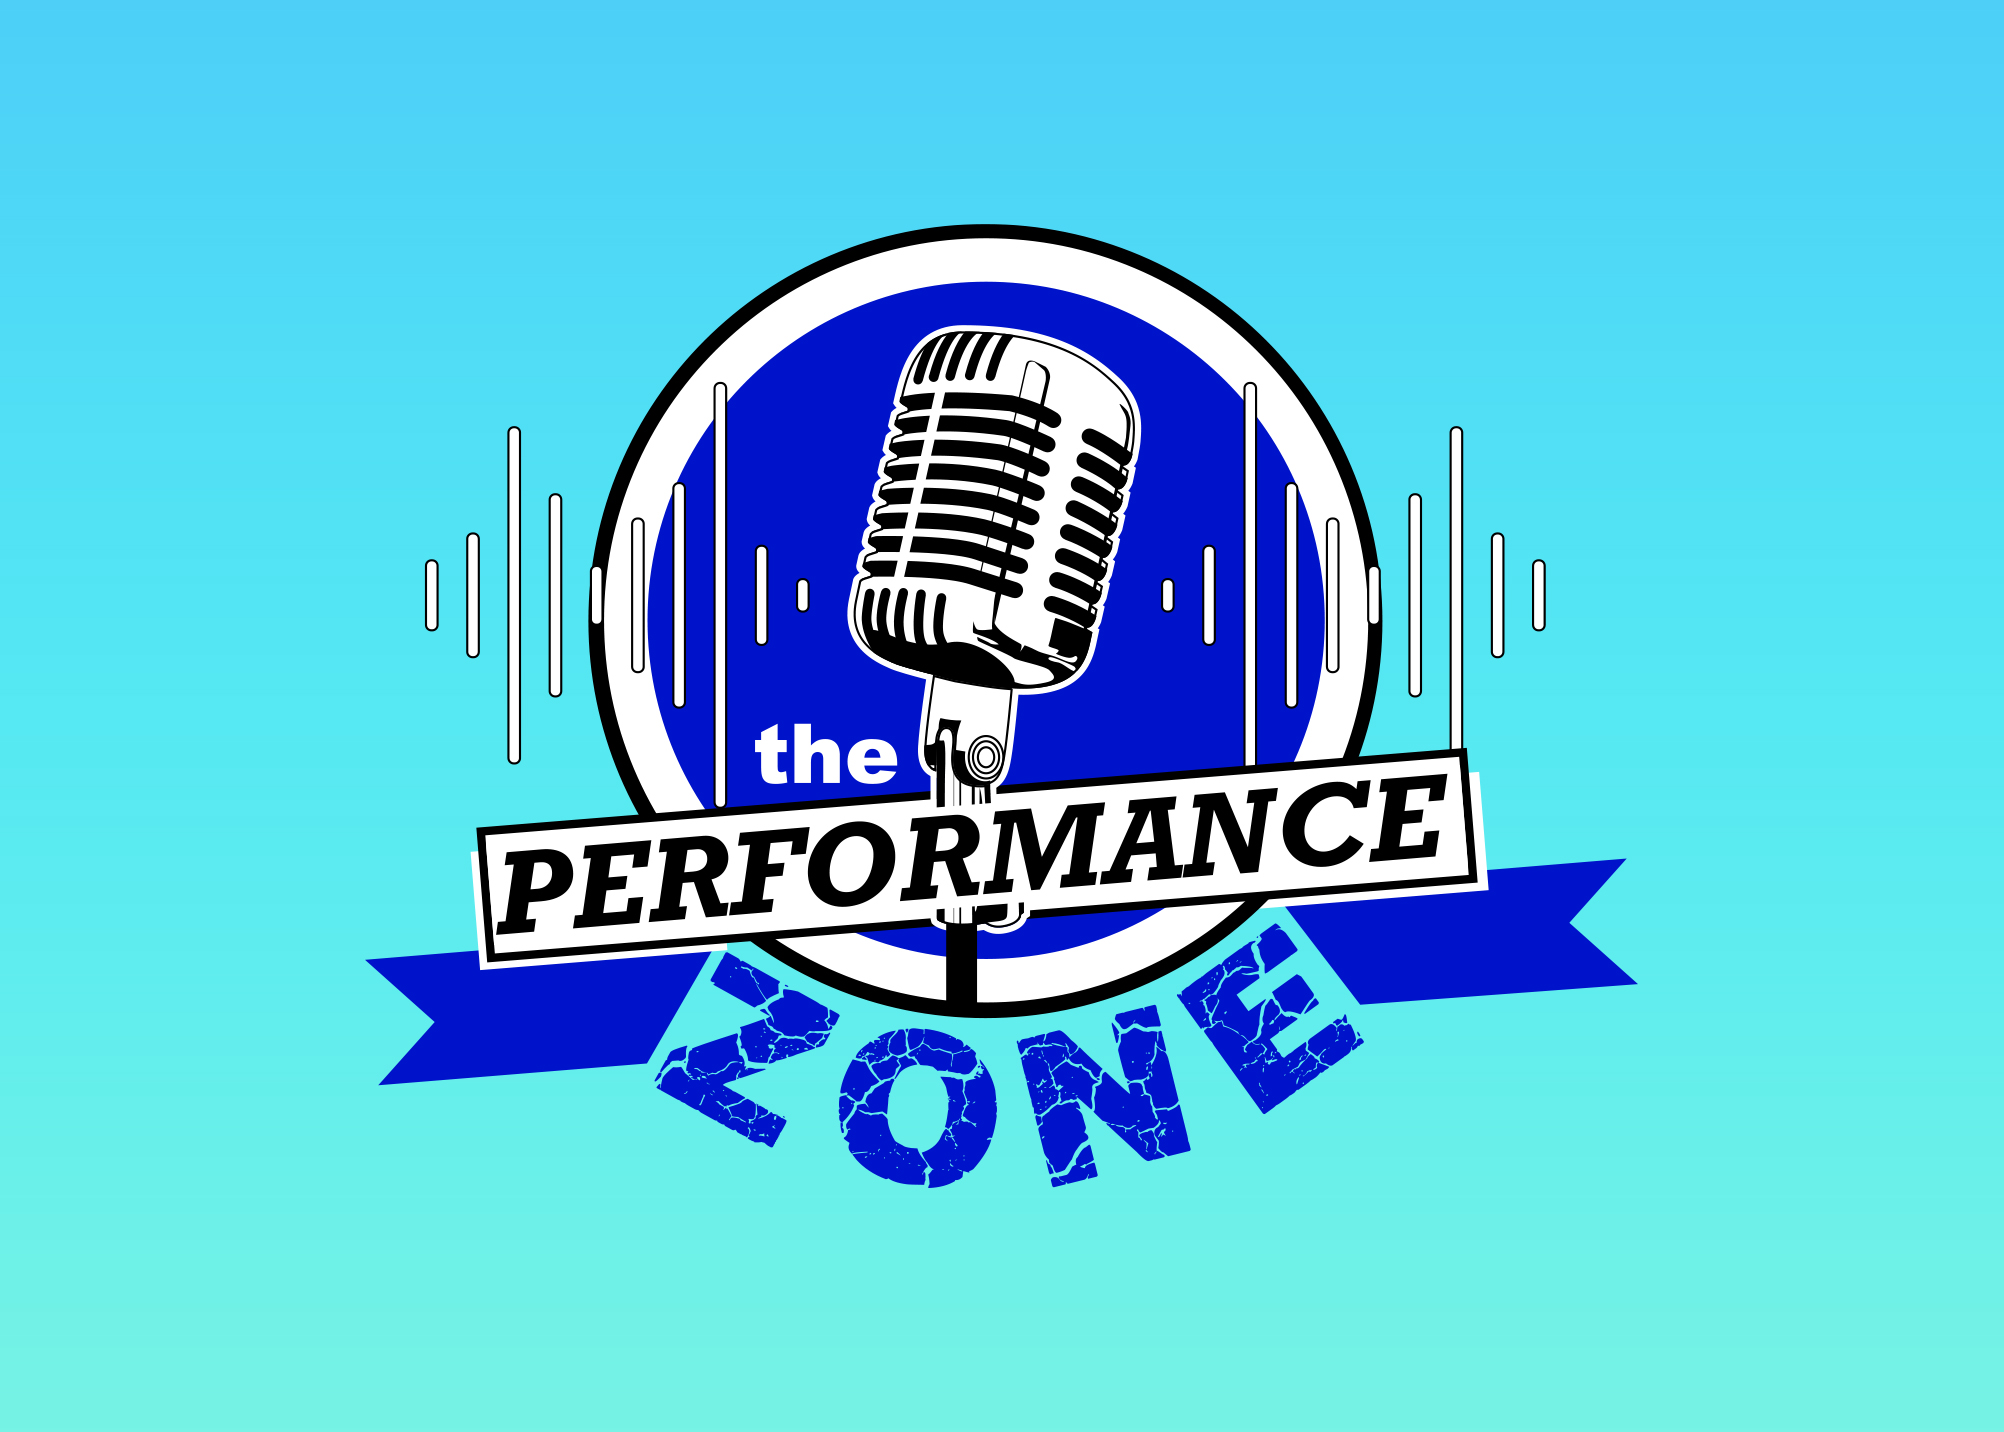 The Performance Zone logo